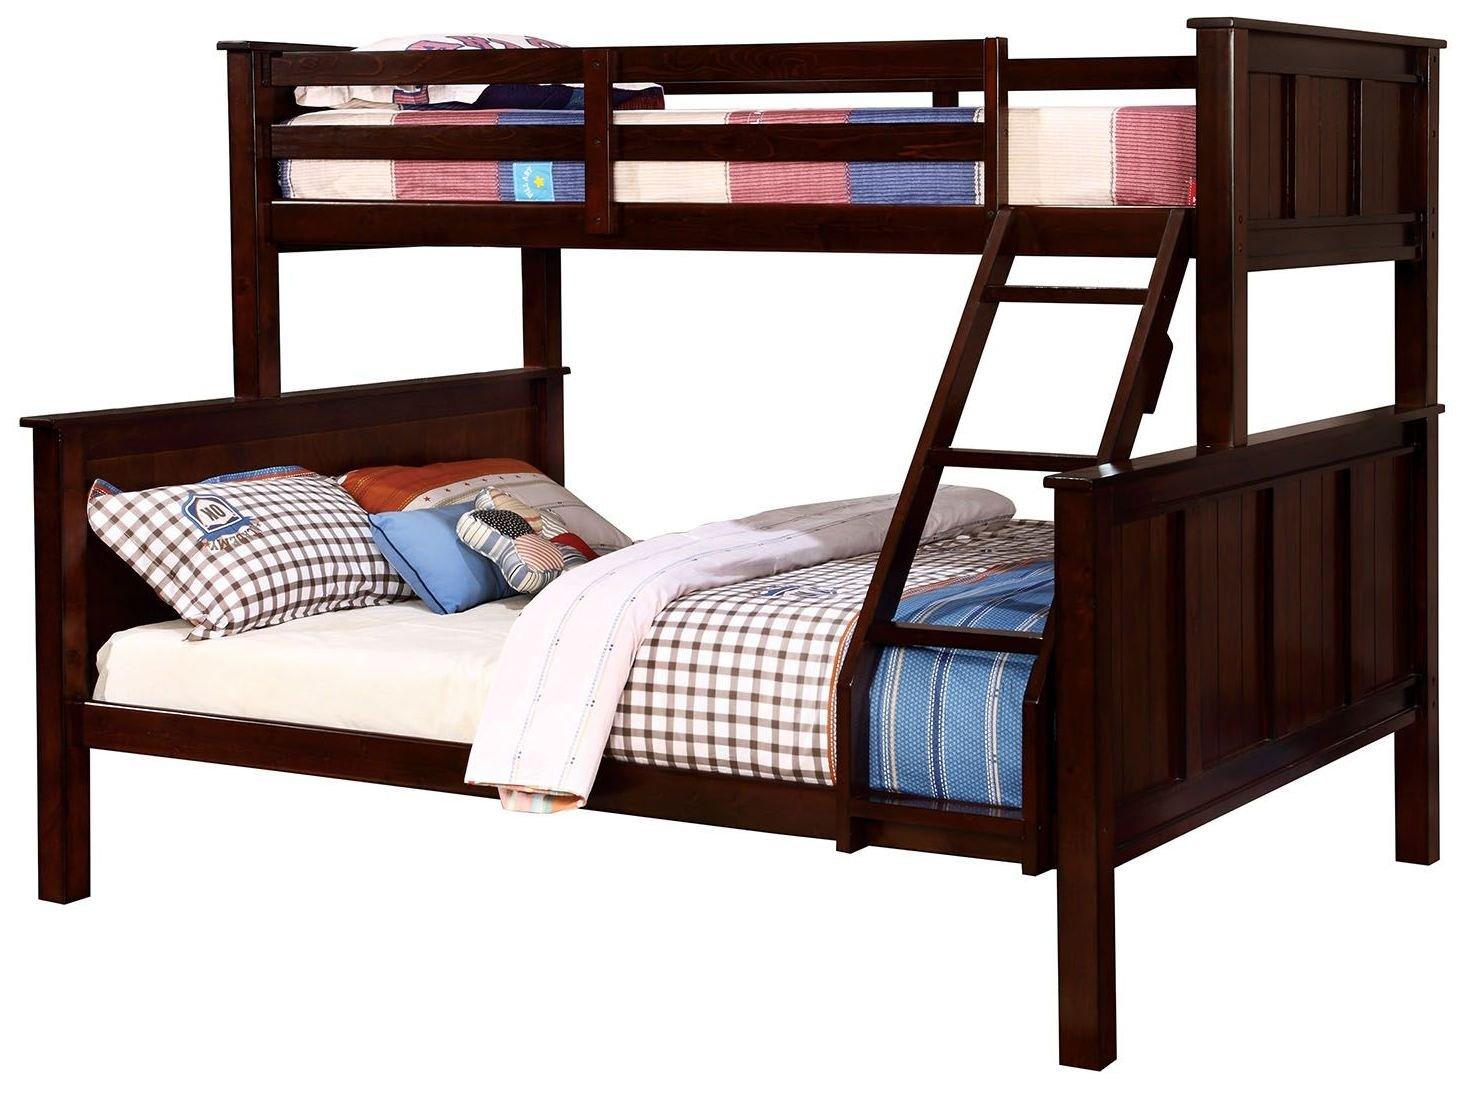 Amazoncom Furniture Of America Gracie Dark Walnut Twin Over Queen